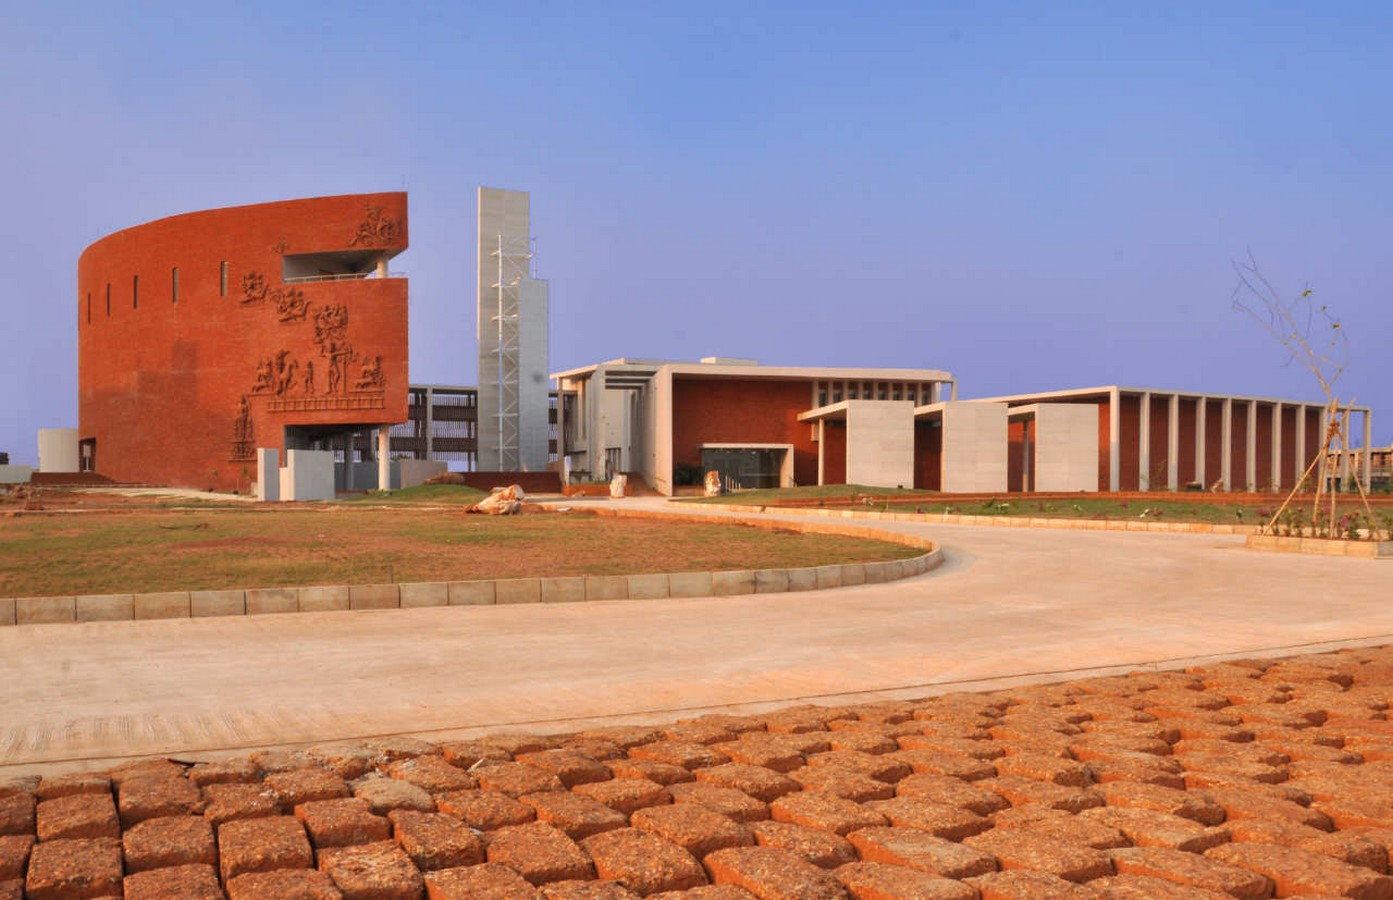 International Management Institute, Bhubaneshwar, Orissa - Sheet1